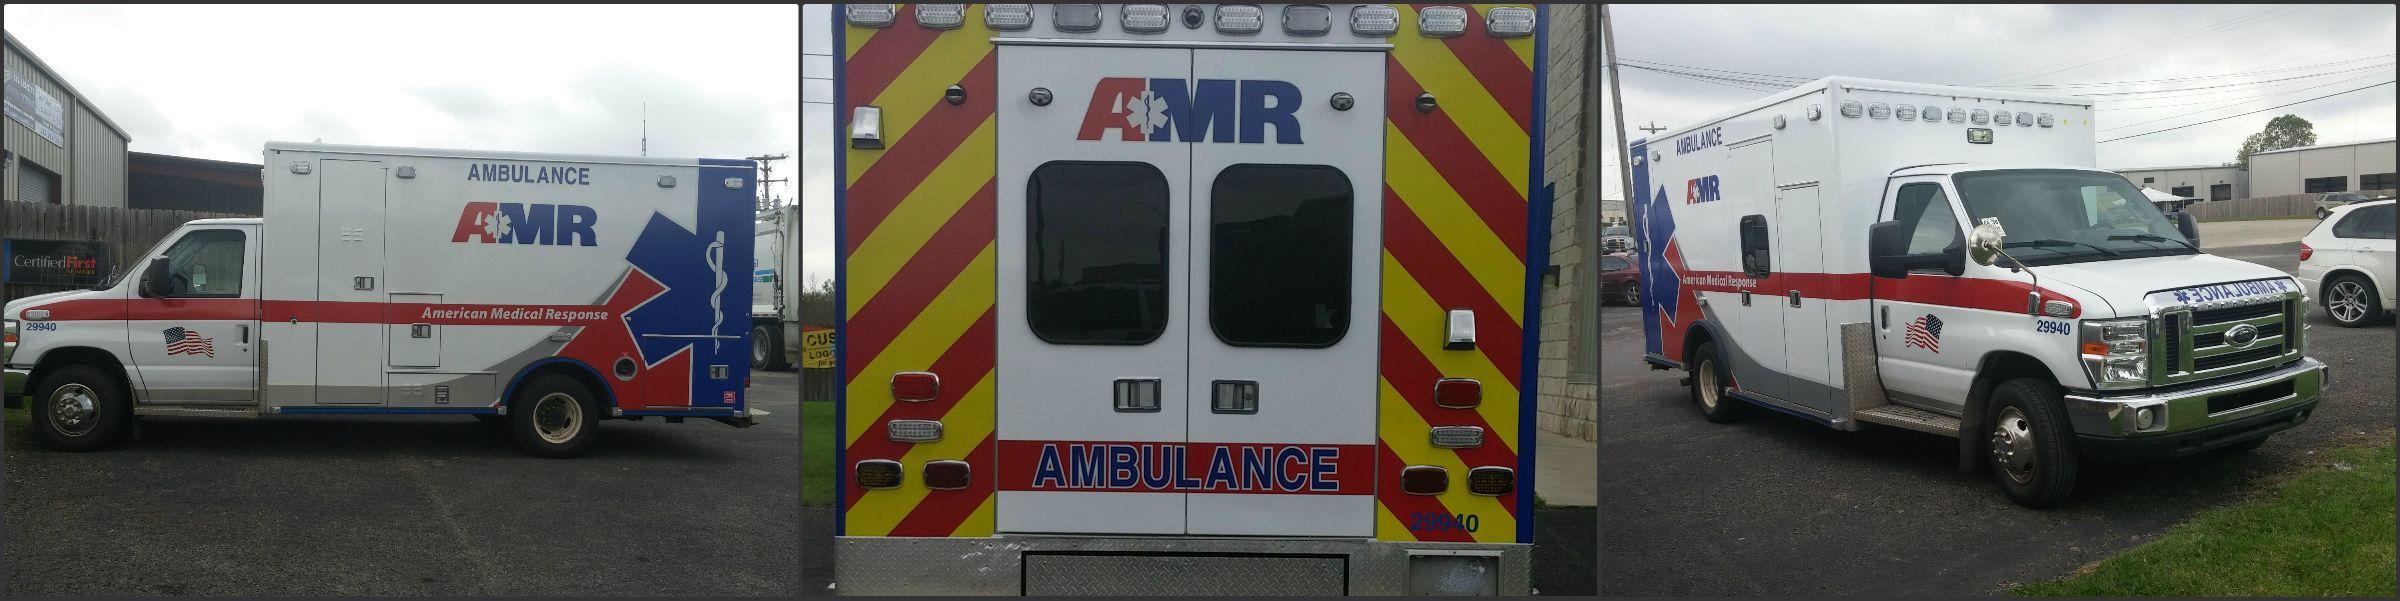 San Antonio all reflective decals on Box Ambulance